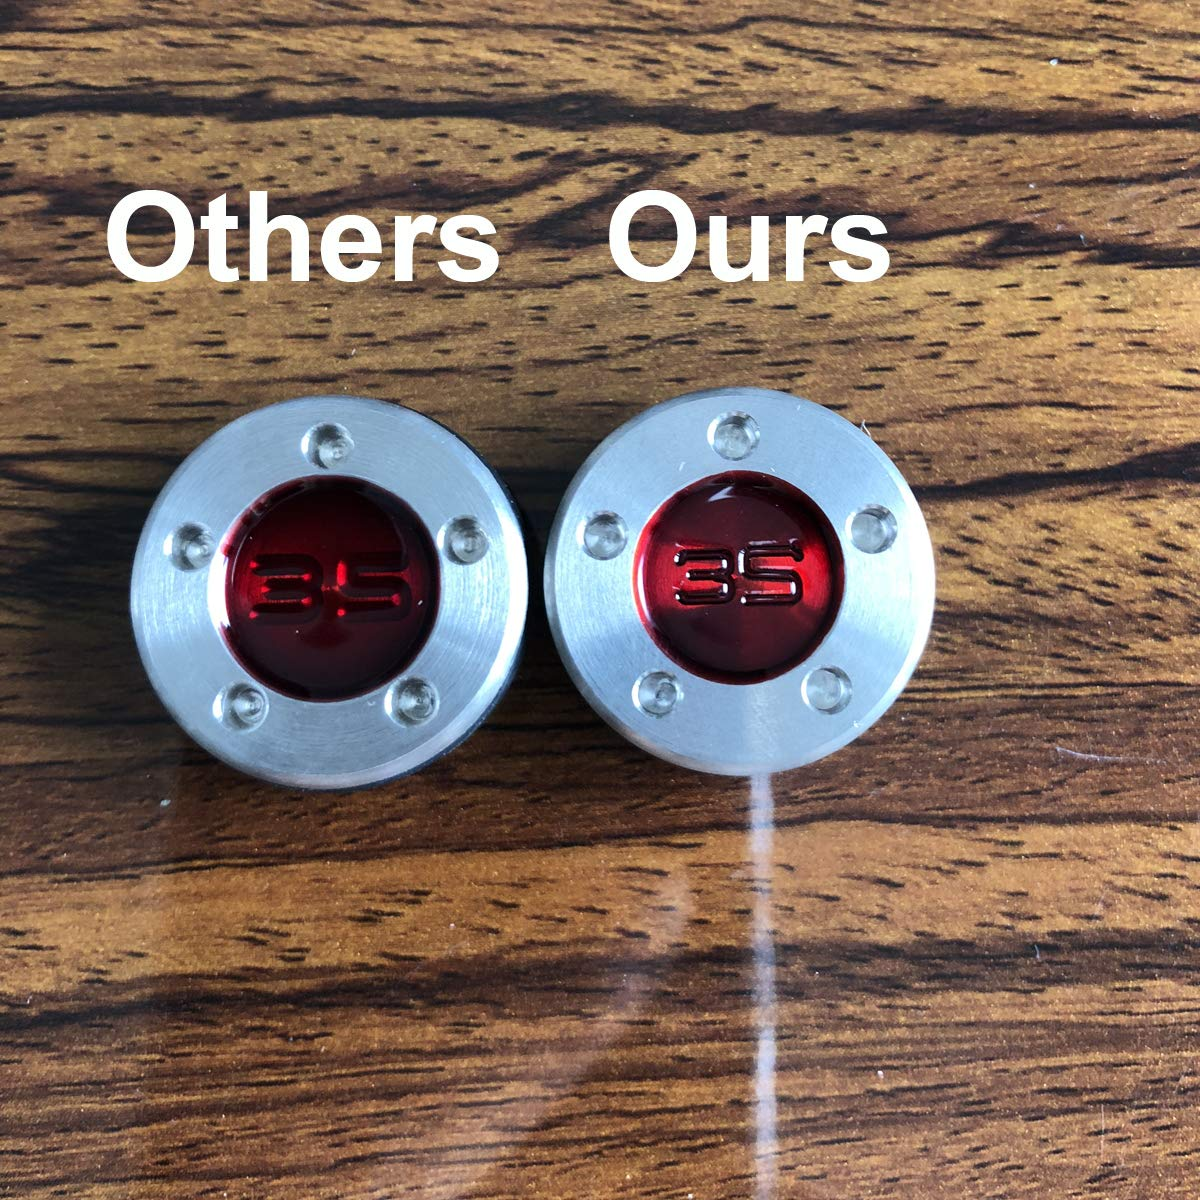 SummerHouse Custom Putter Weights 【 5g, 10g, 15g, 20g, 25g, 30g, 35g, 40g 】 for Scotty Cameron Select Newport Studio Design California GoLo Futura X Series Clubs Head (35)